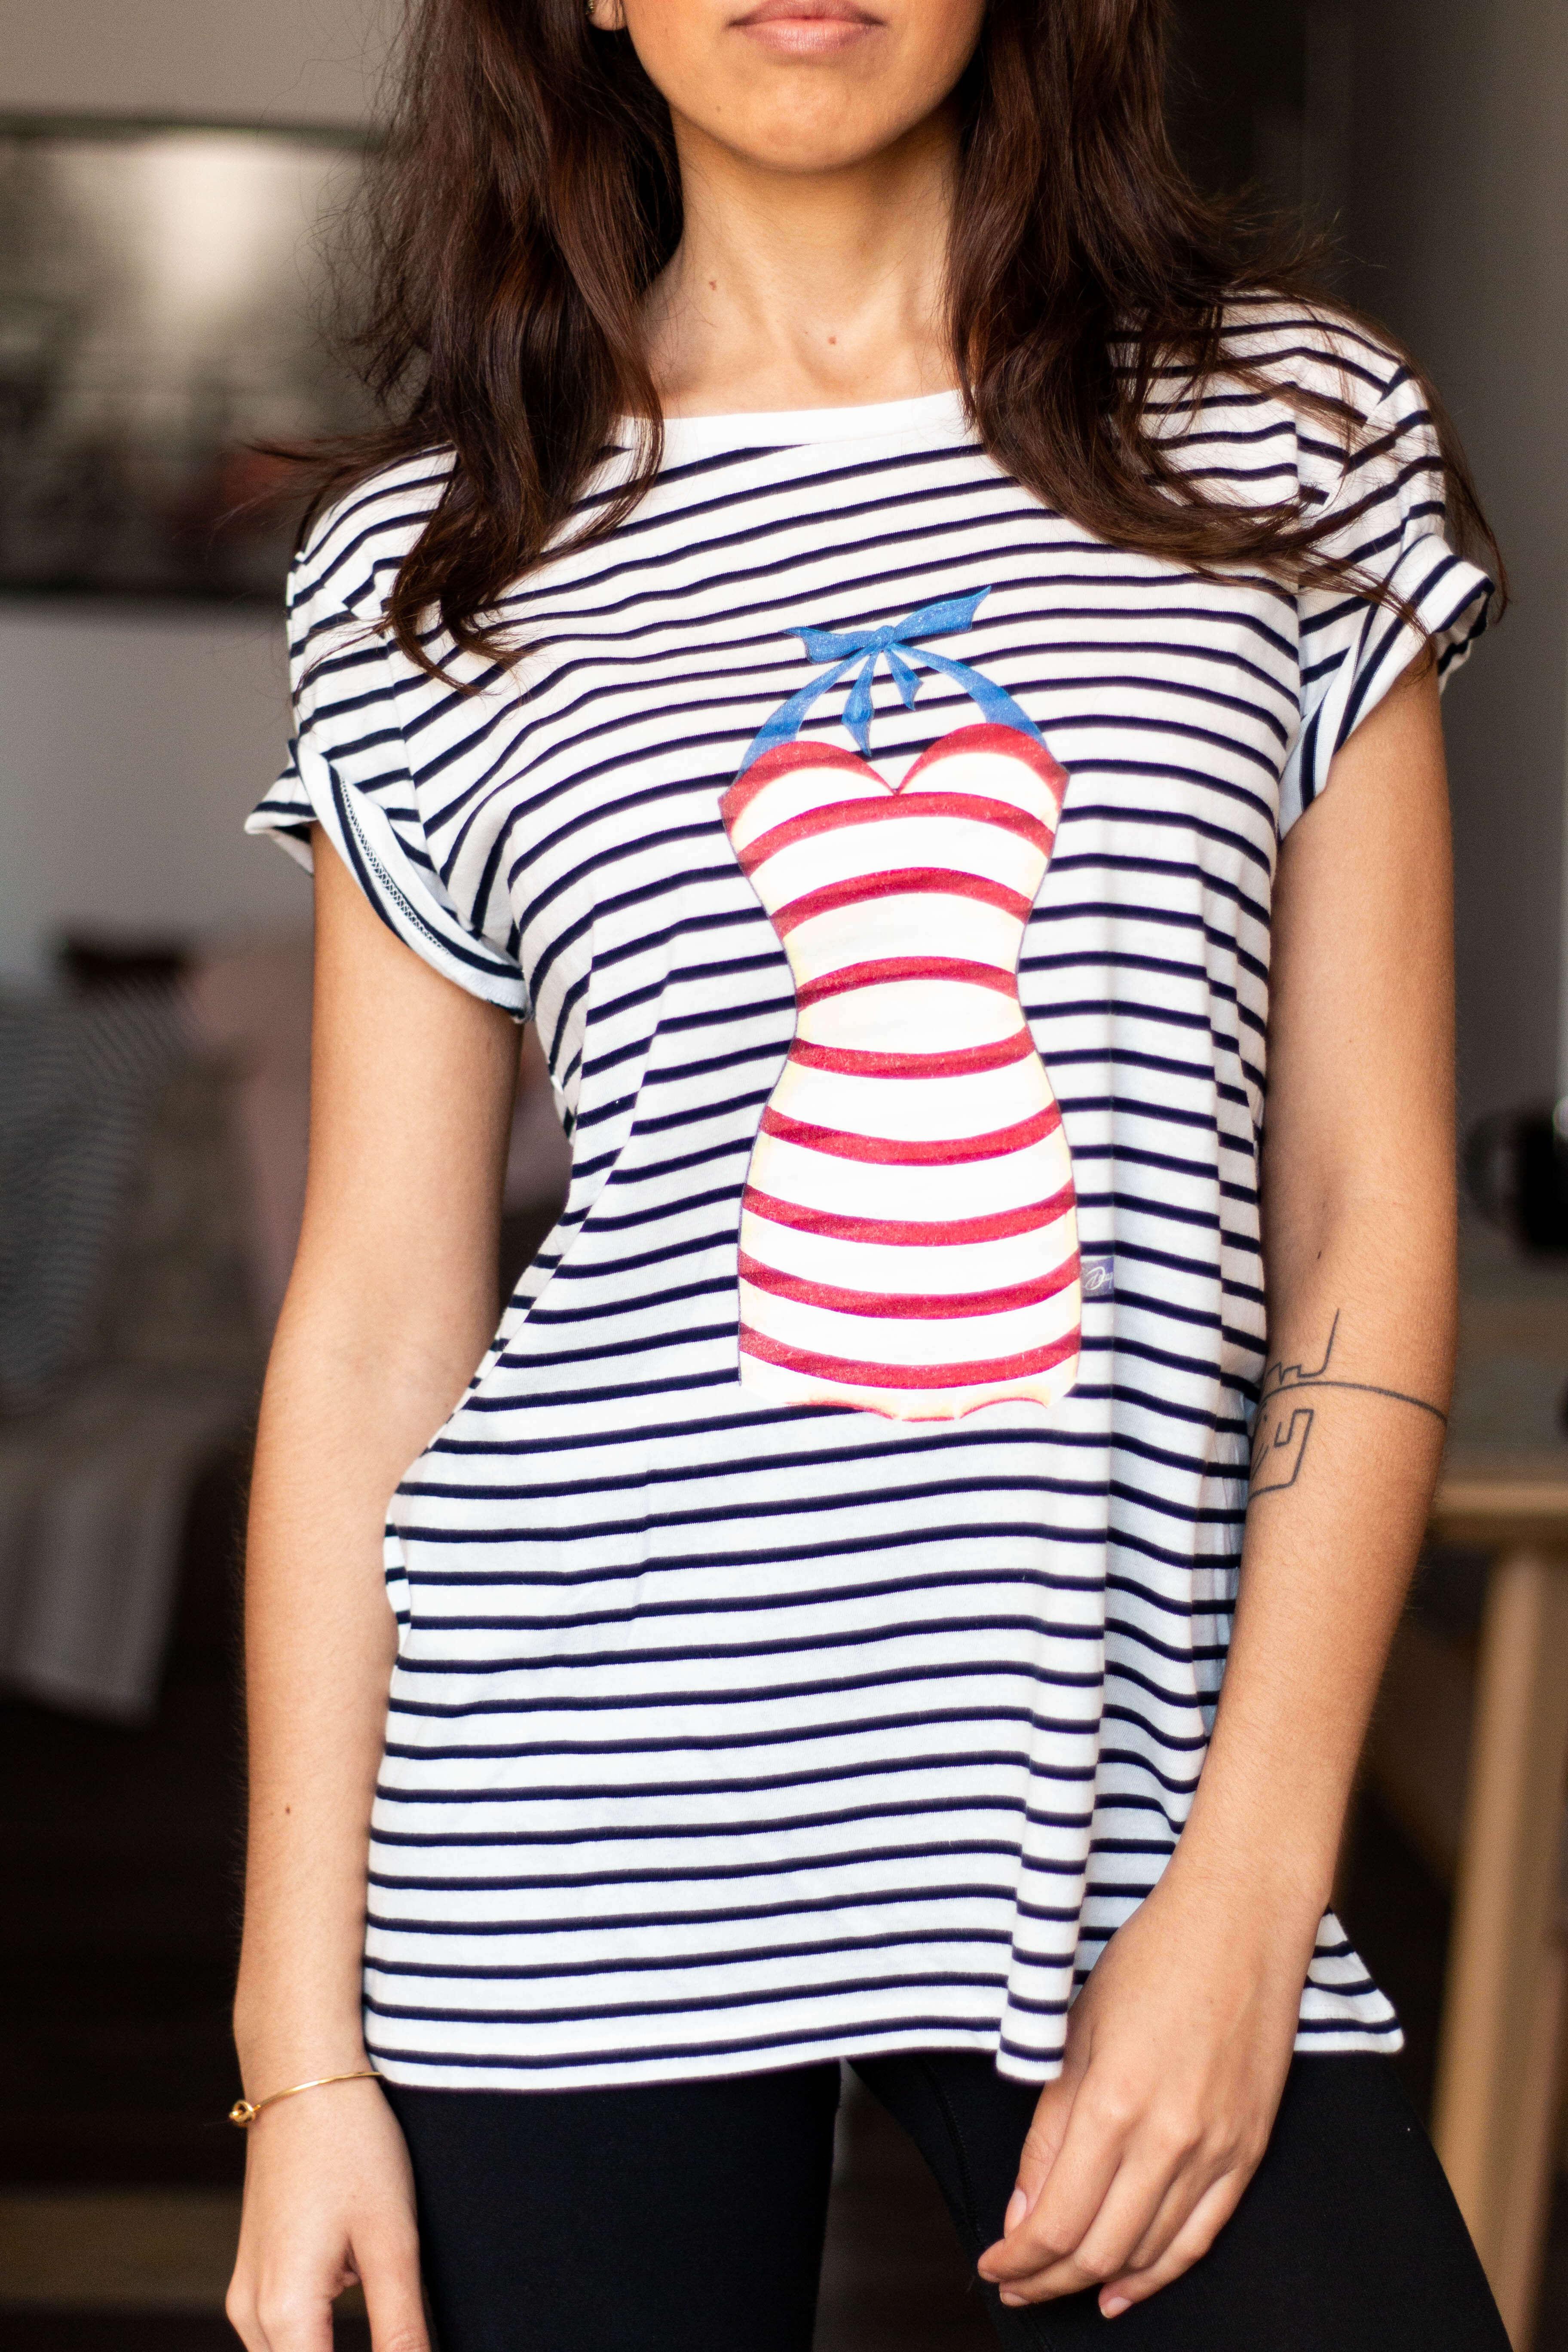 Camiseta decage rayas manga corta